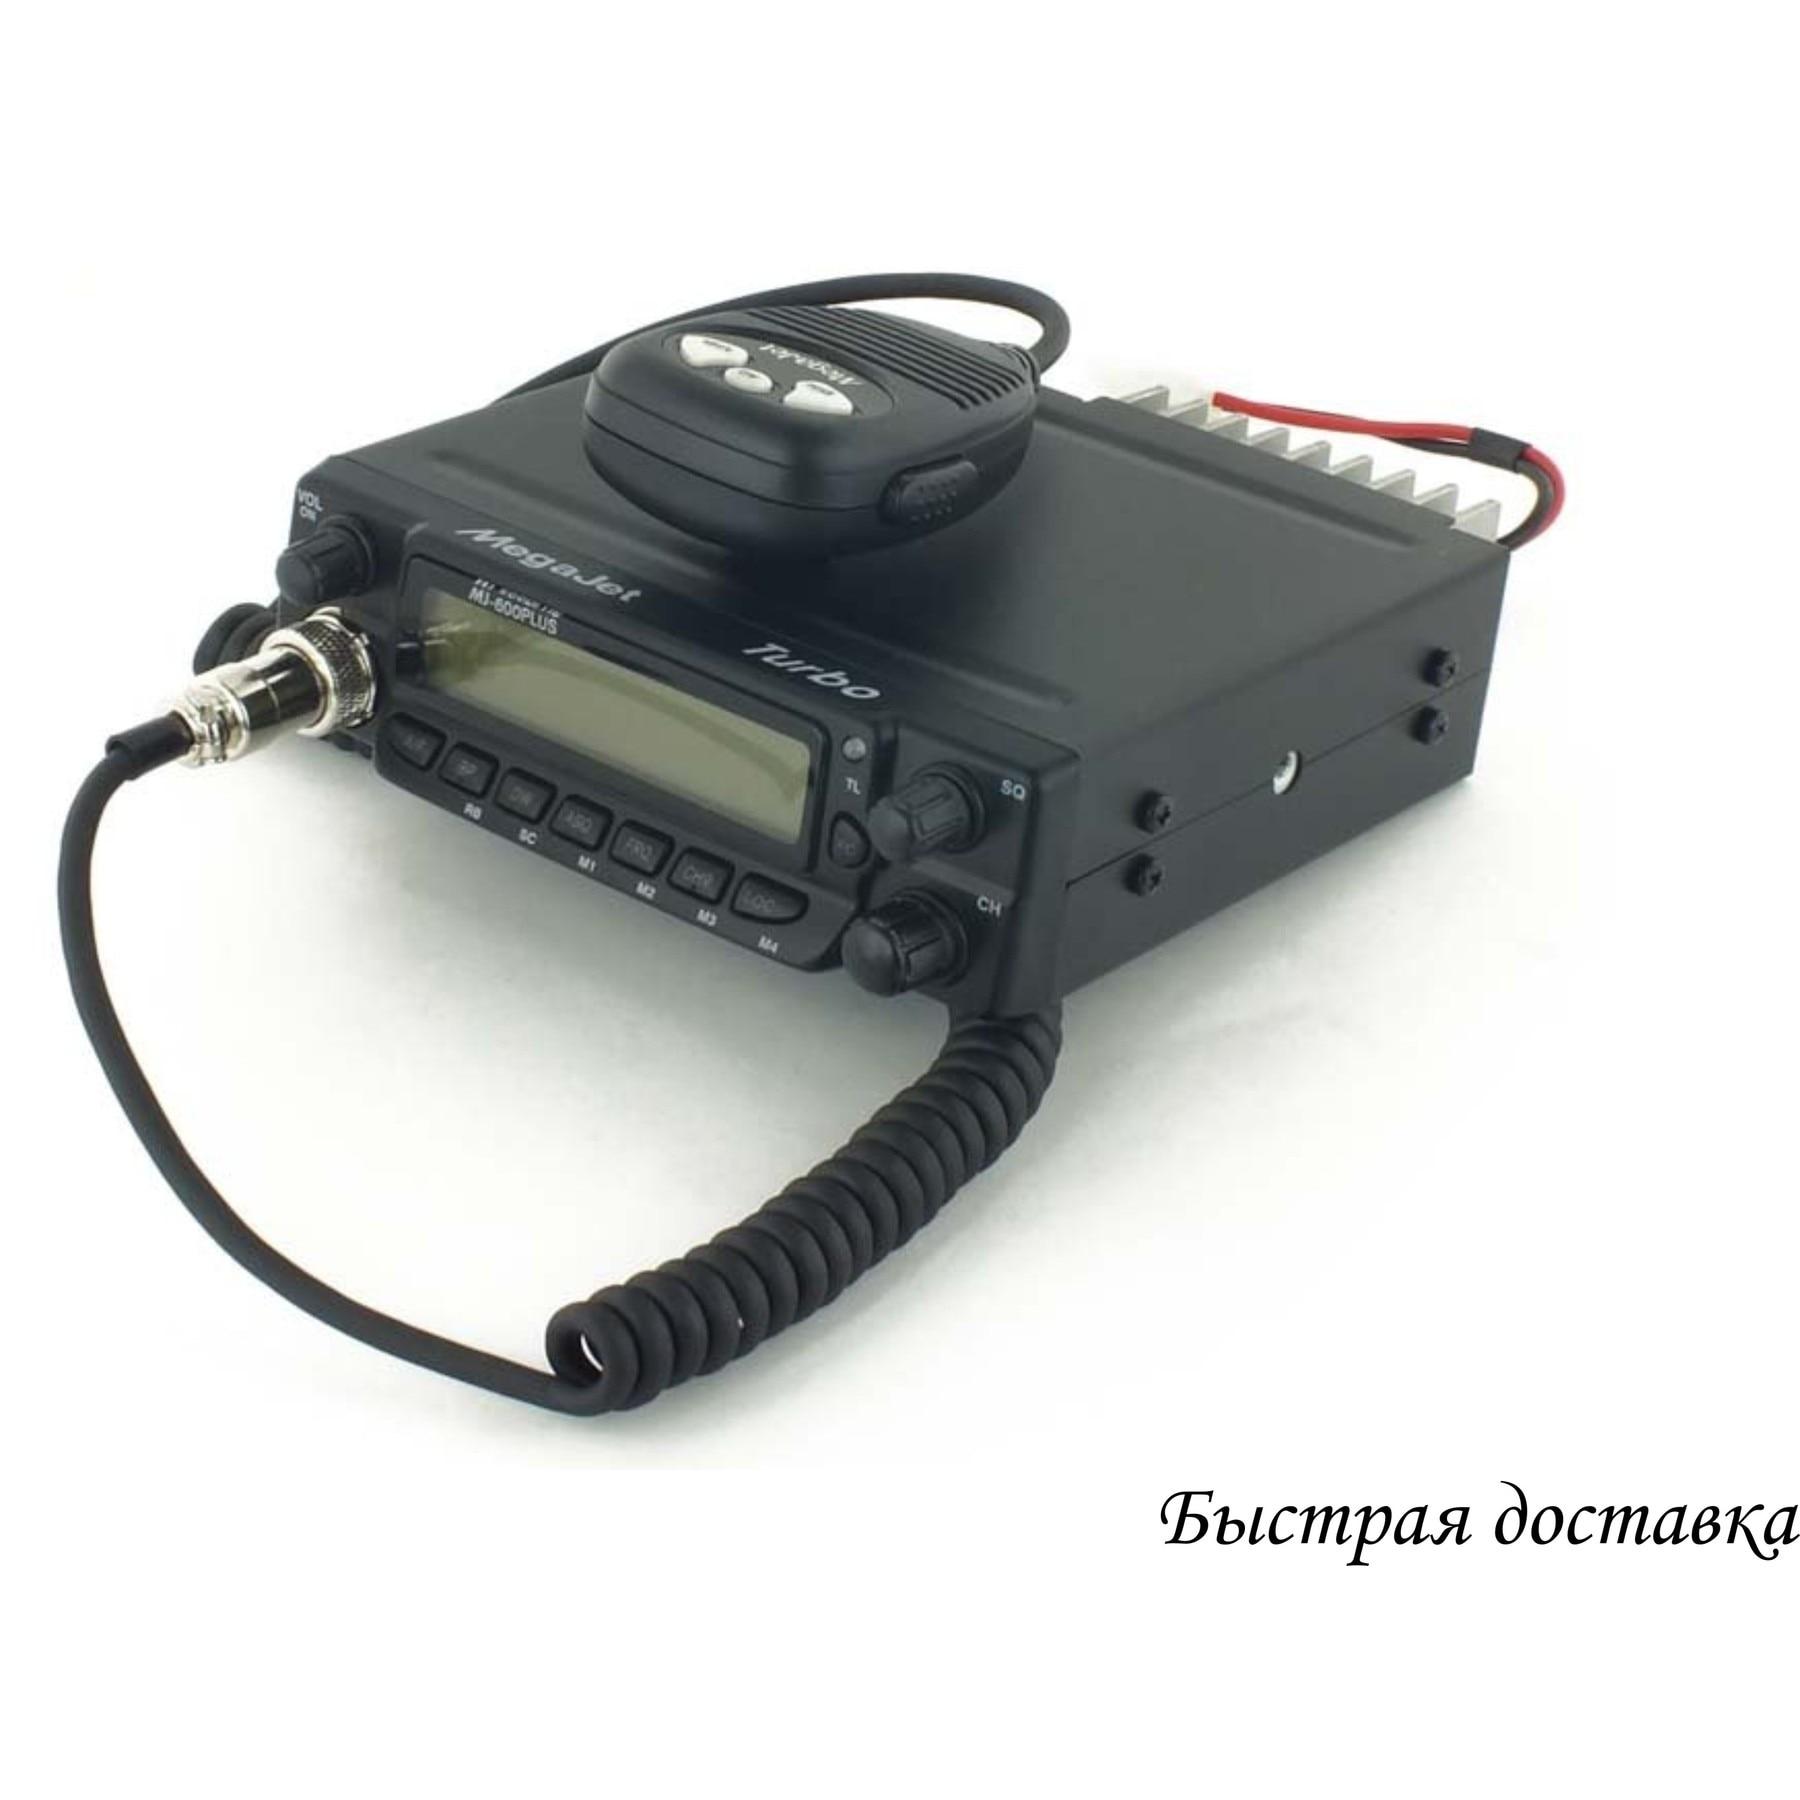 Radio Megajet Mj-600 + Turbo. Дальнобойщикам 20 W. Fast Shipping.